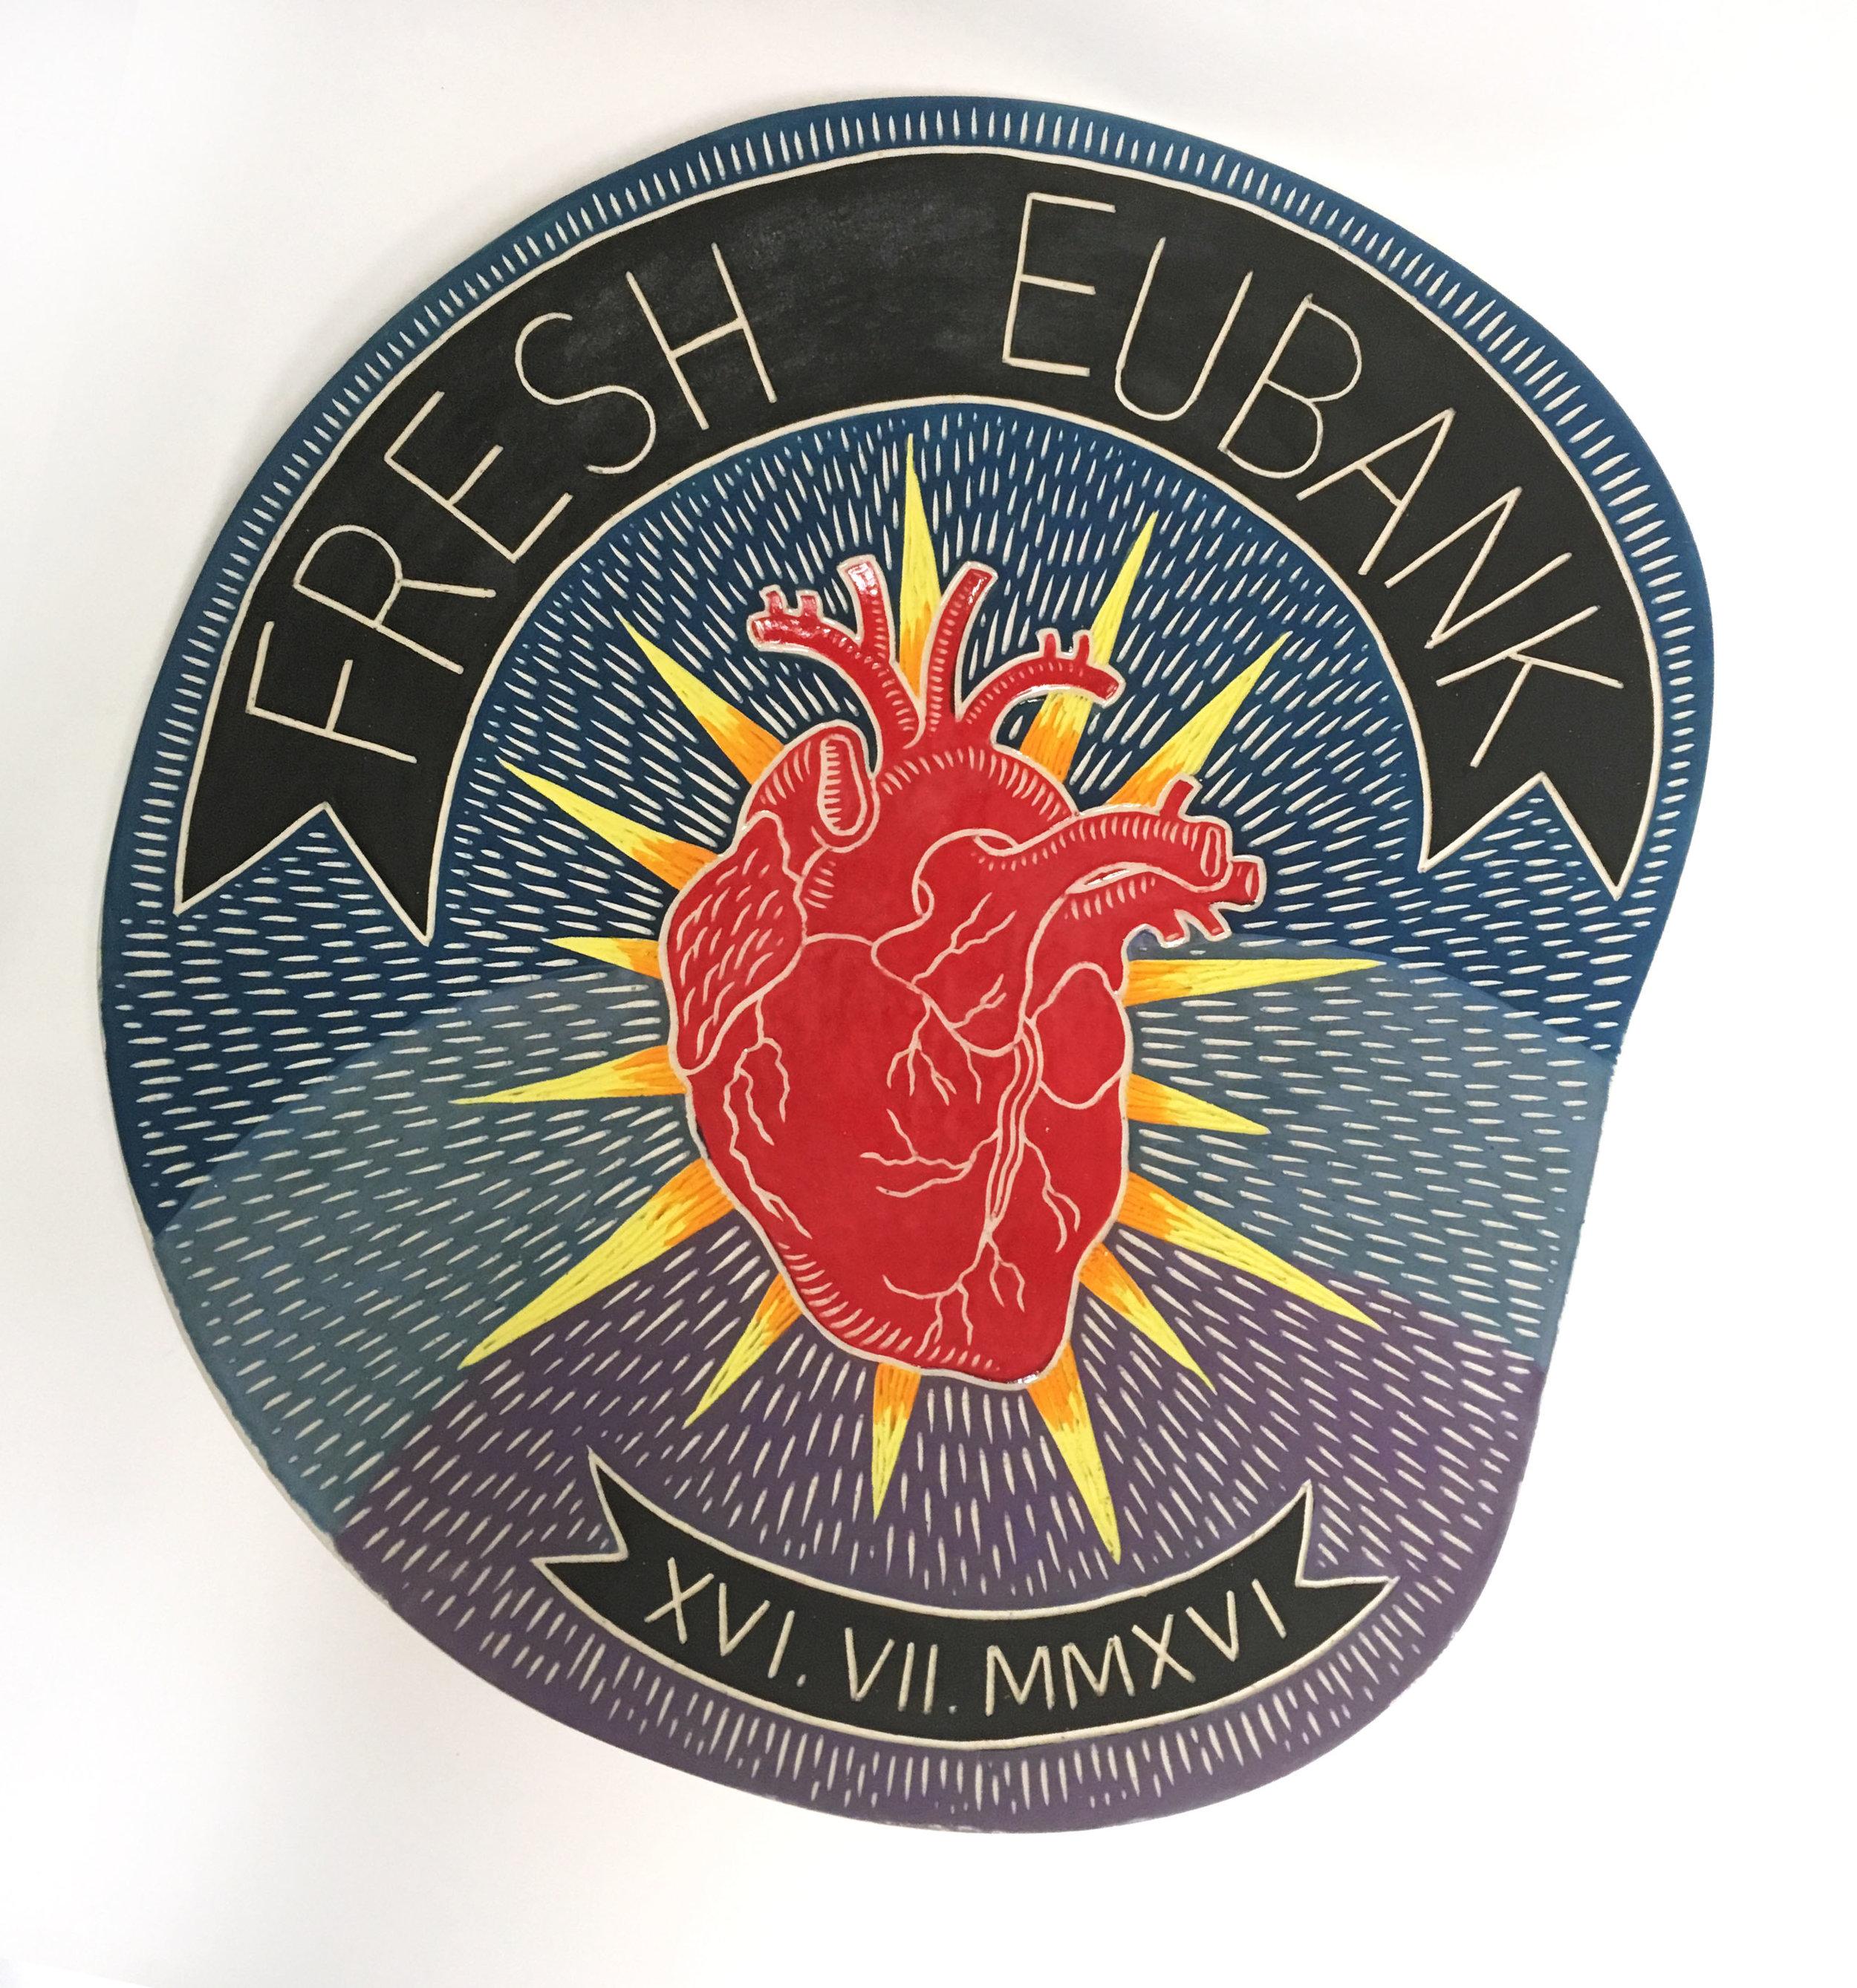 Fresh-Eubank wedding platter, 2016